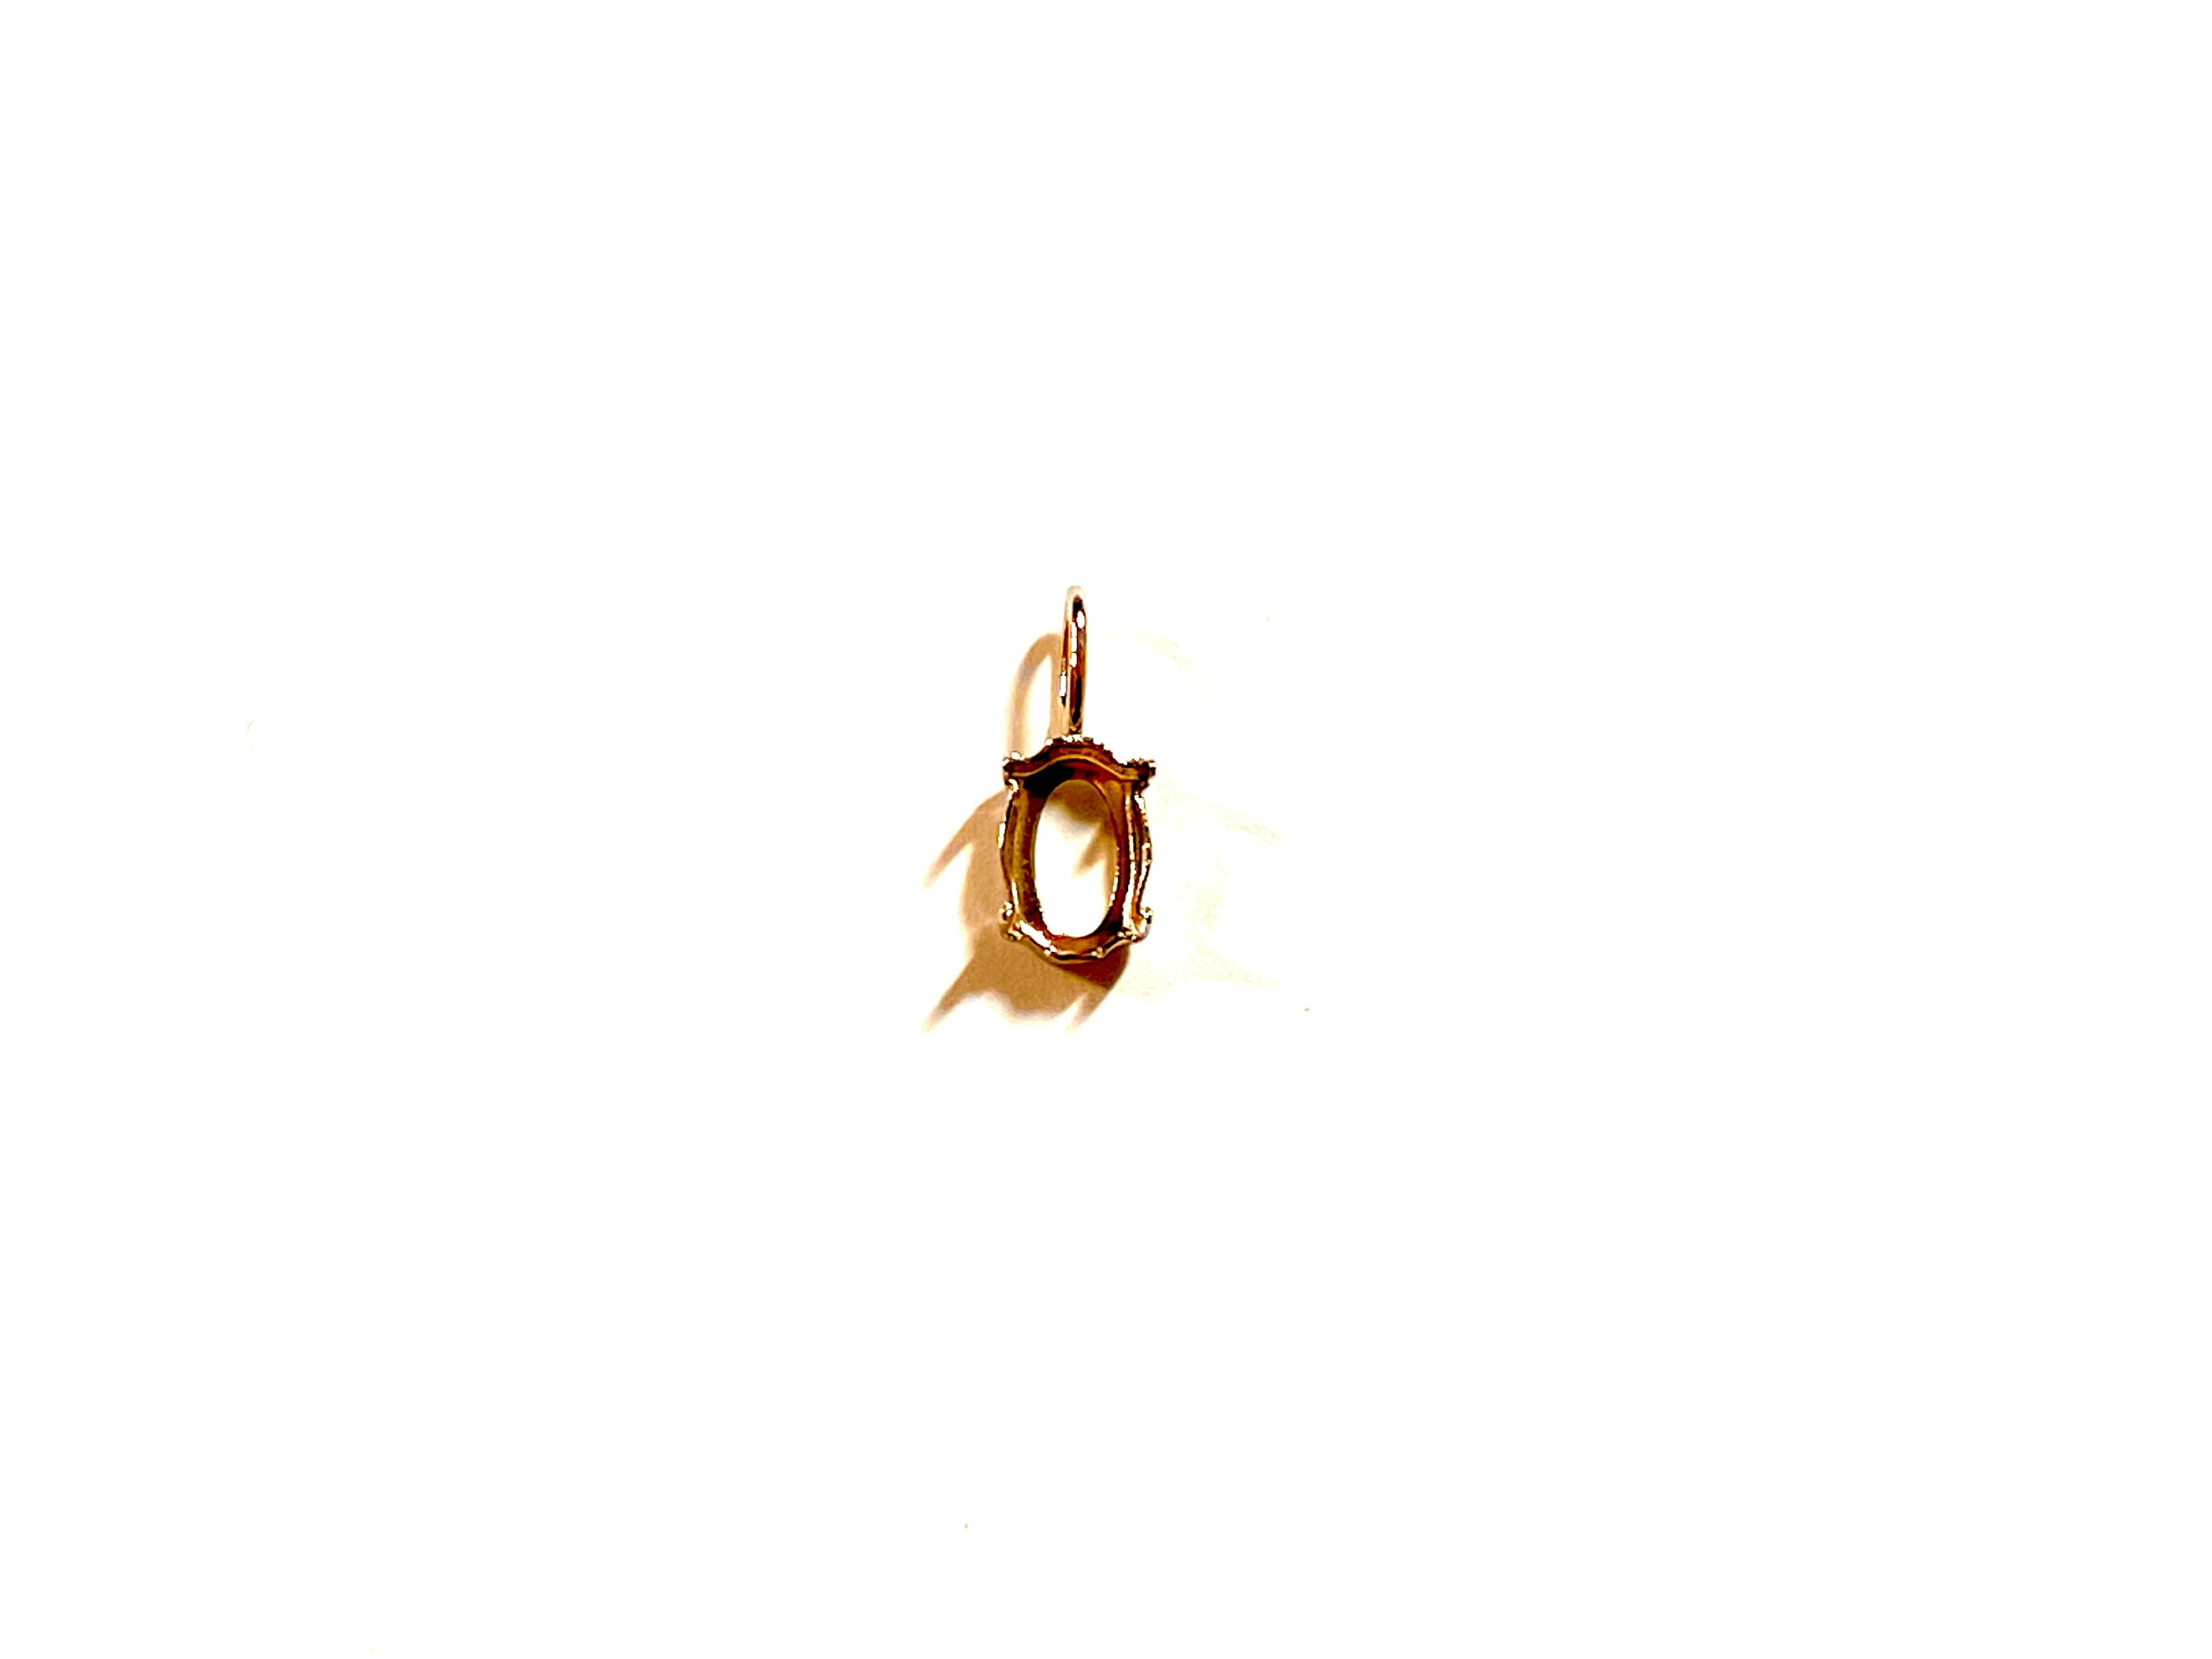 【K10YG】『タテ6mm ヨコ4mm』 オーバルカット対応空枠 [空枠No,6]